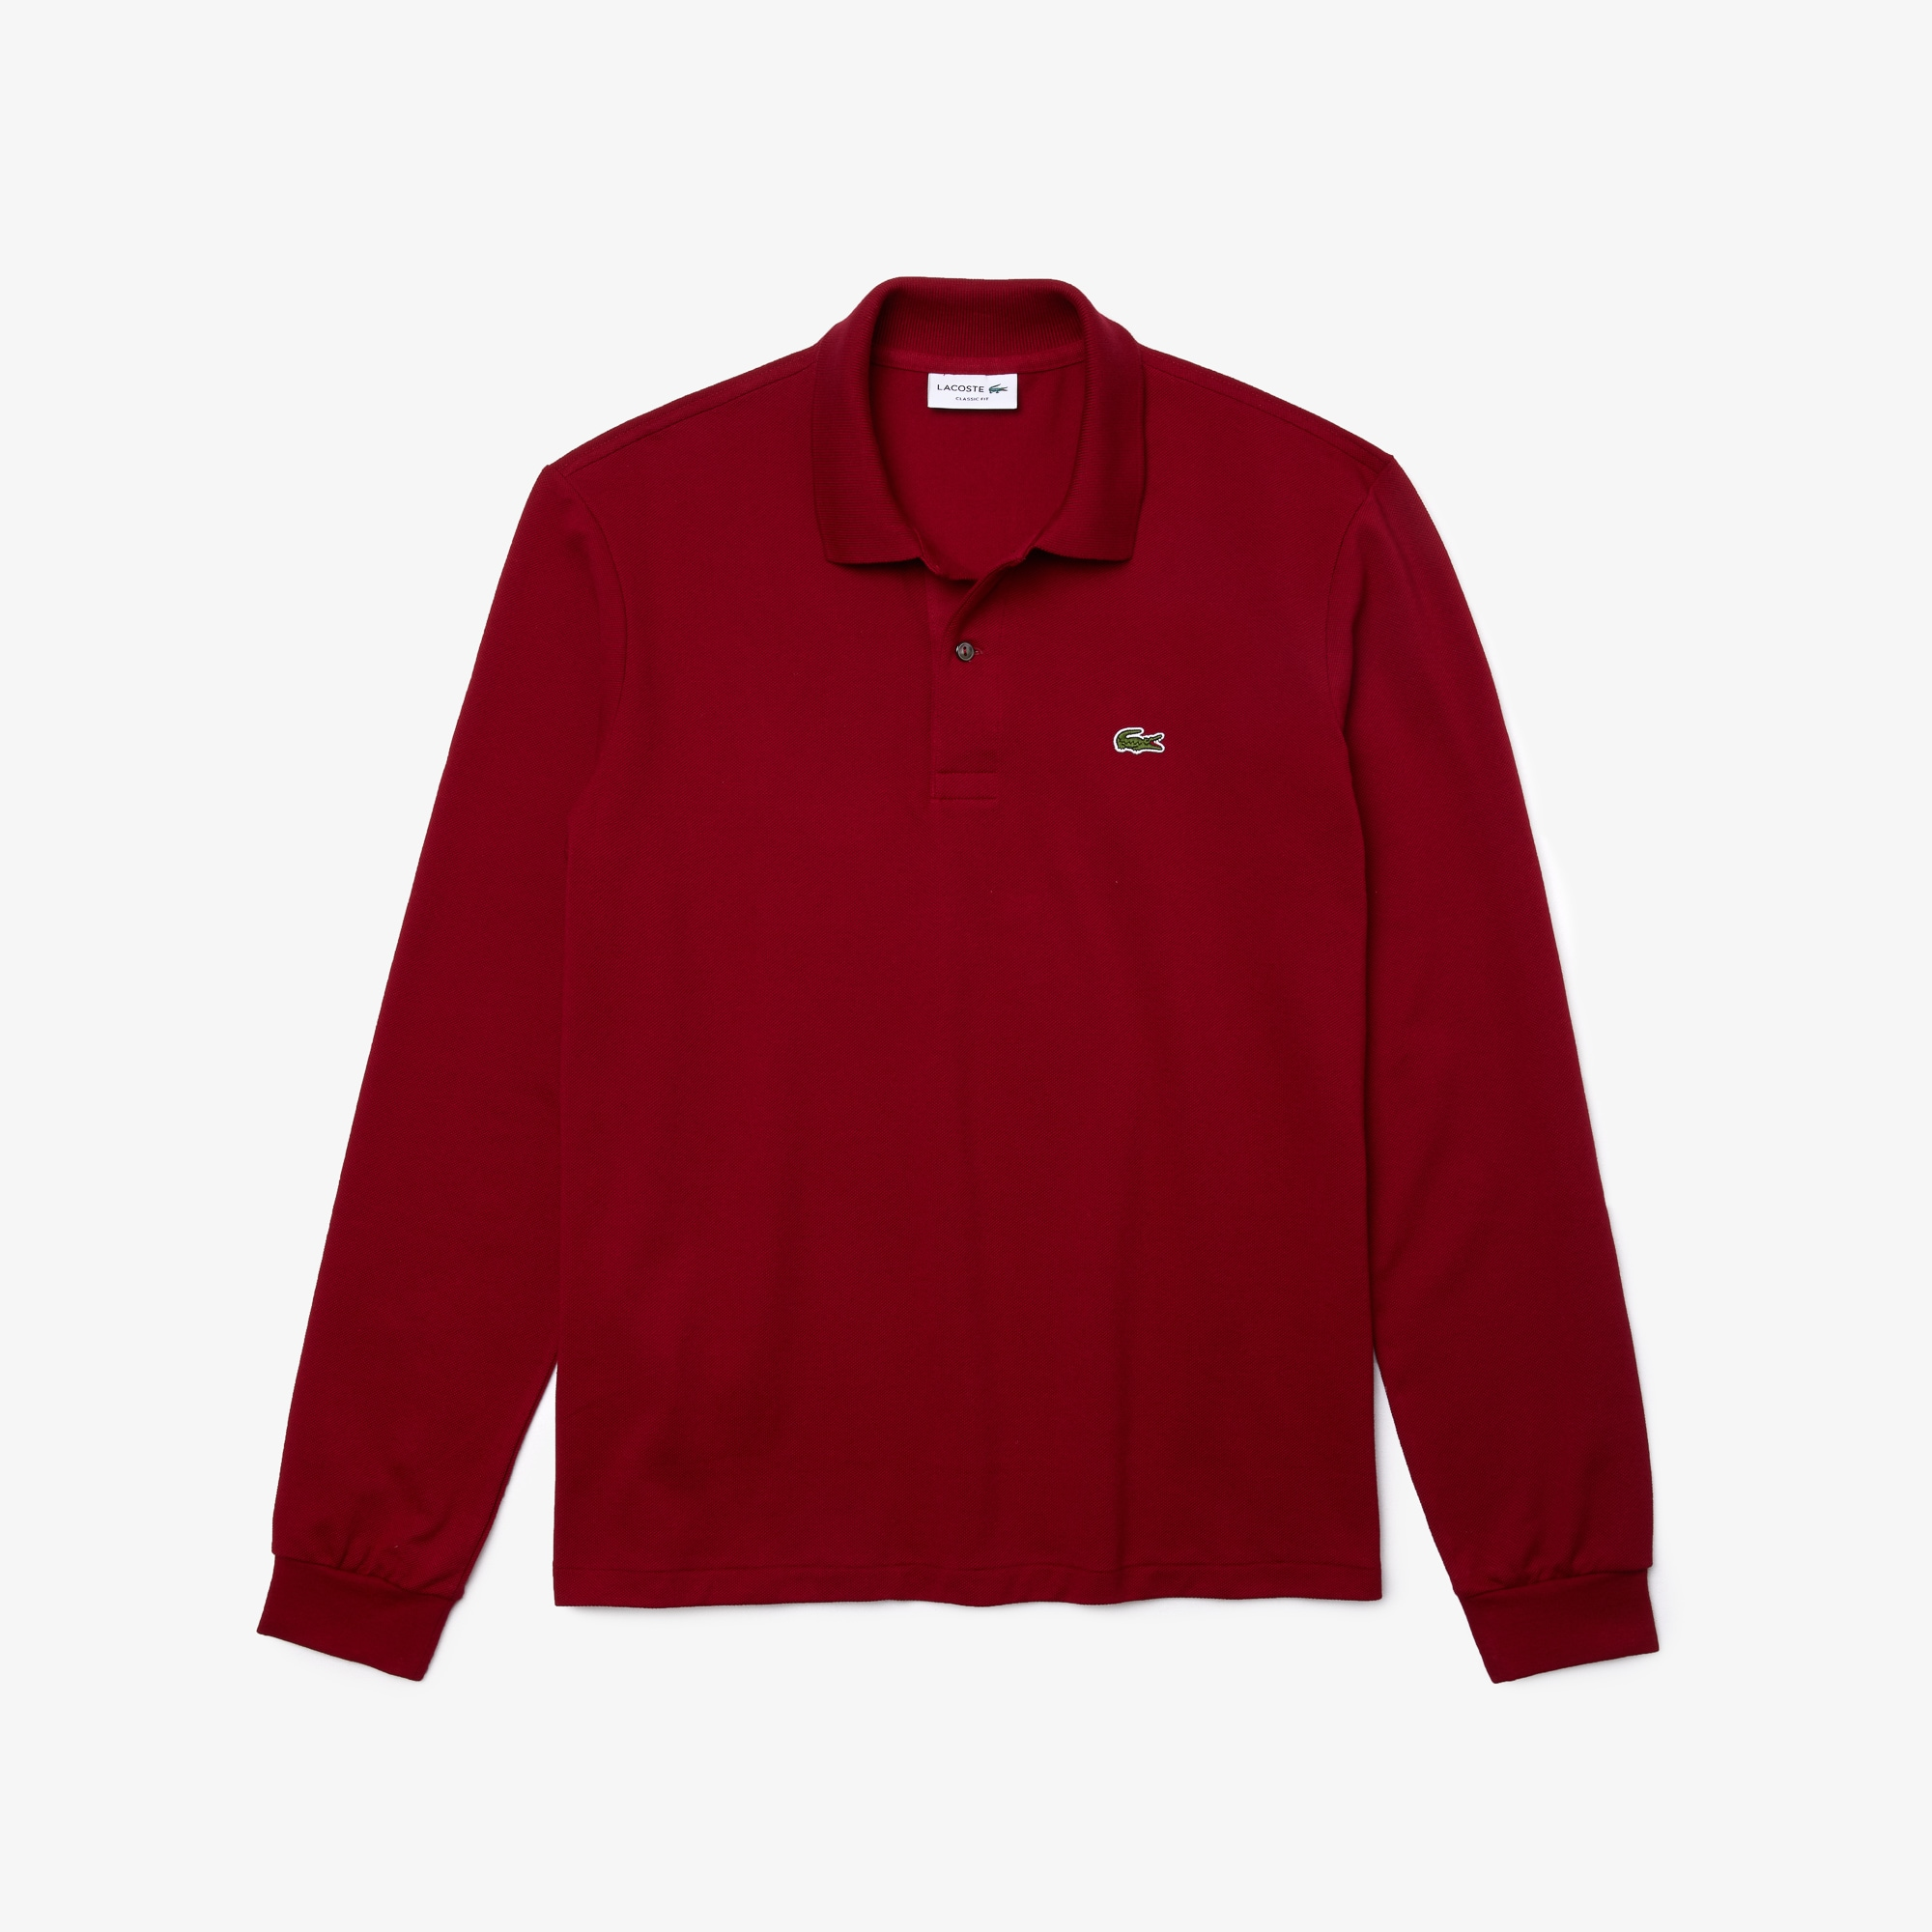 Men 39 s polo shirts lacoste polo shirts for men lacoste for Mens long sleeve pique polo shirts